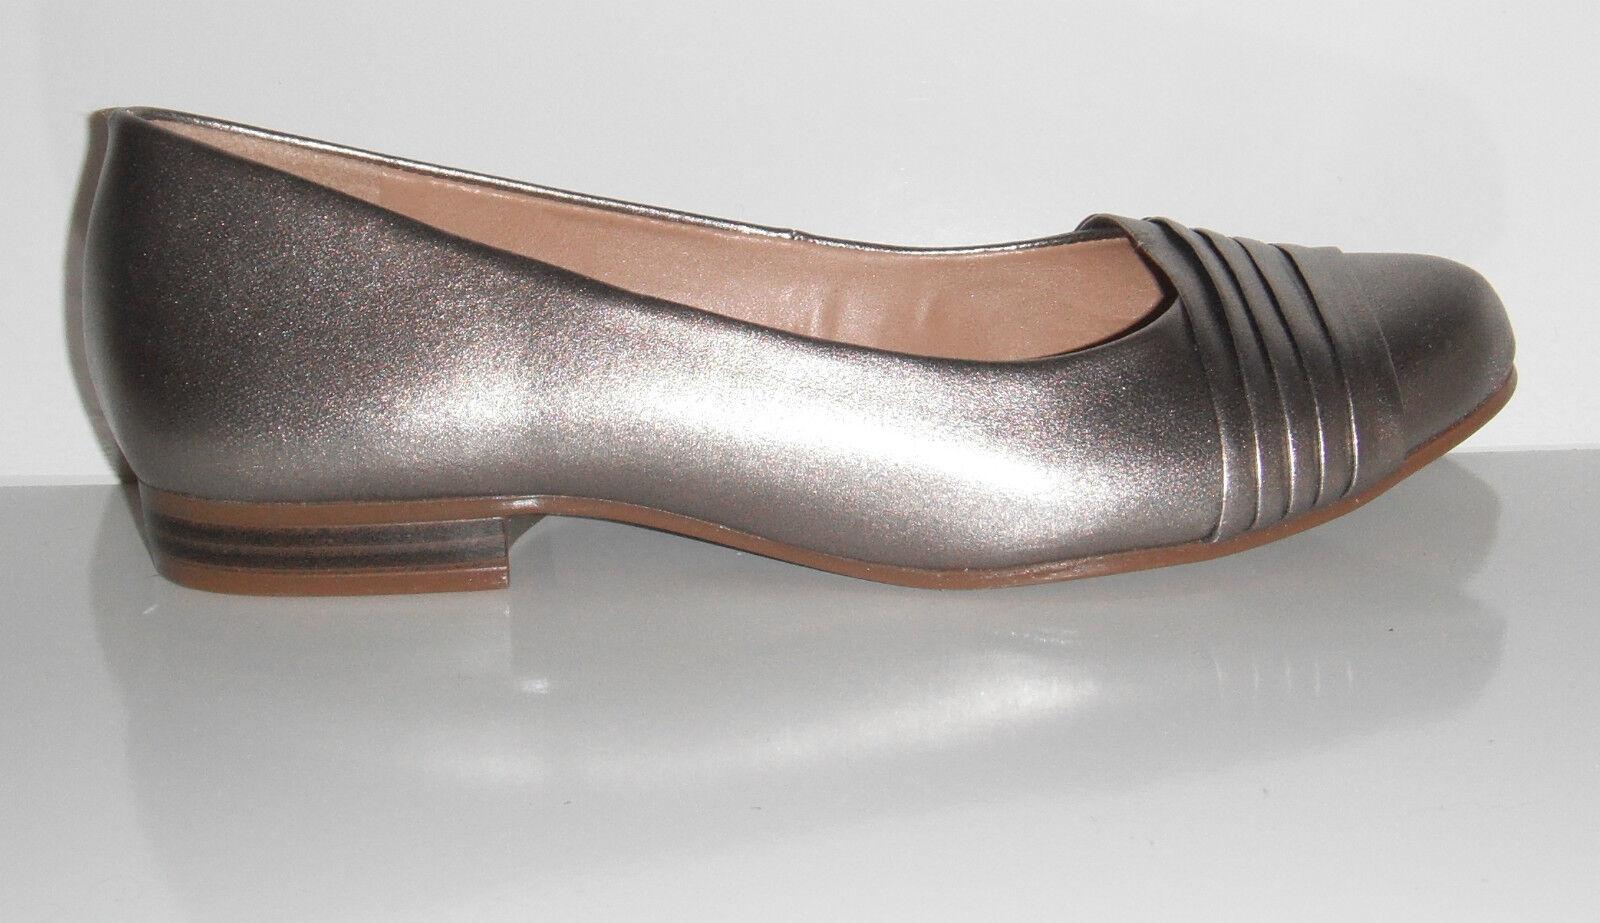 NIB Naturalizer Women's Leana Metallic Leather Ballet Flat shoes sz 6W